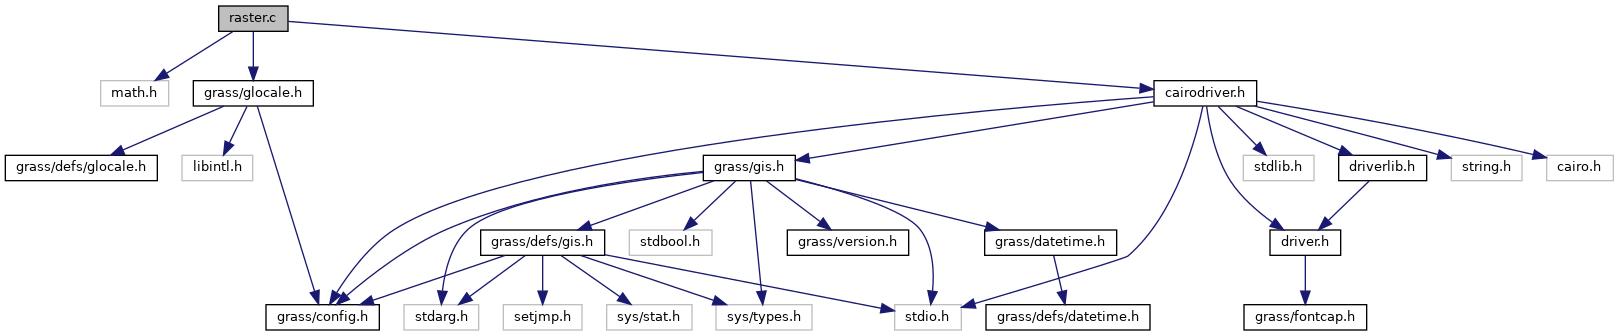 GRASS GIS 7 Programmer's Manual: raster.c File Reference